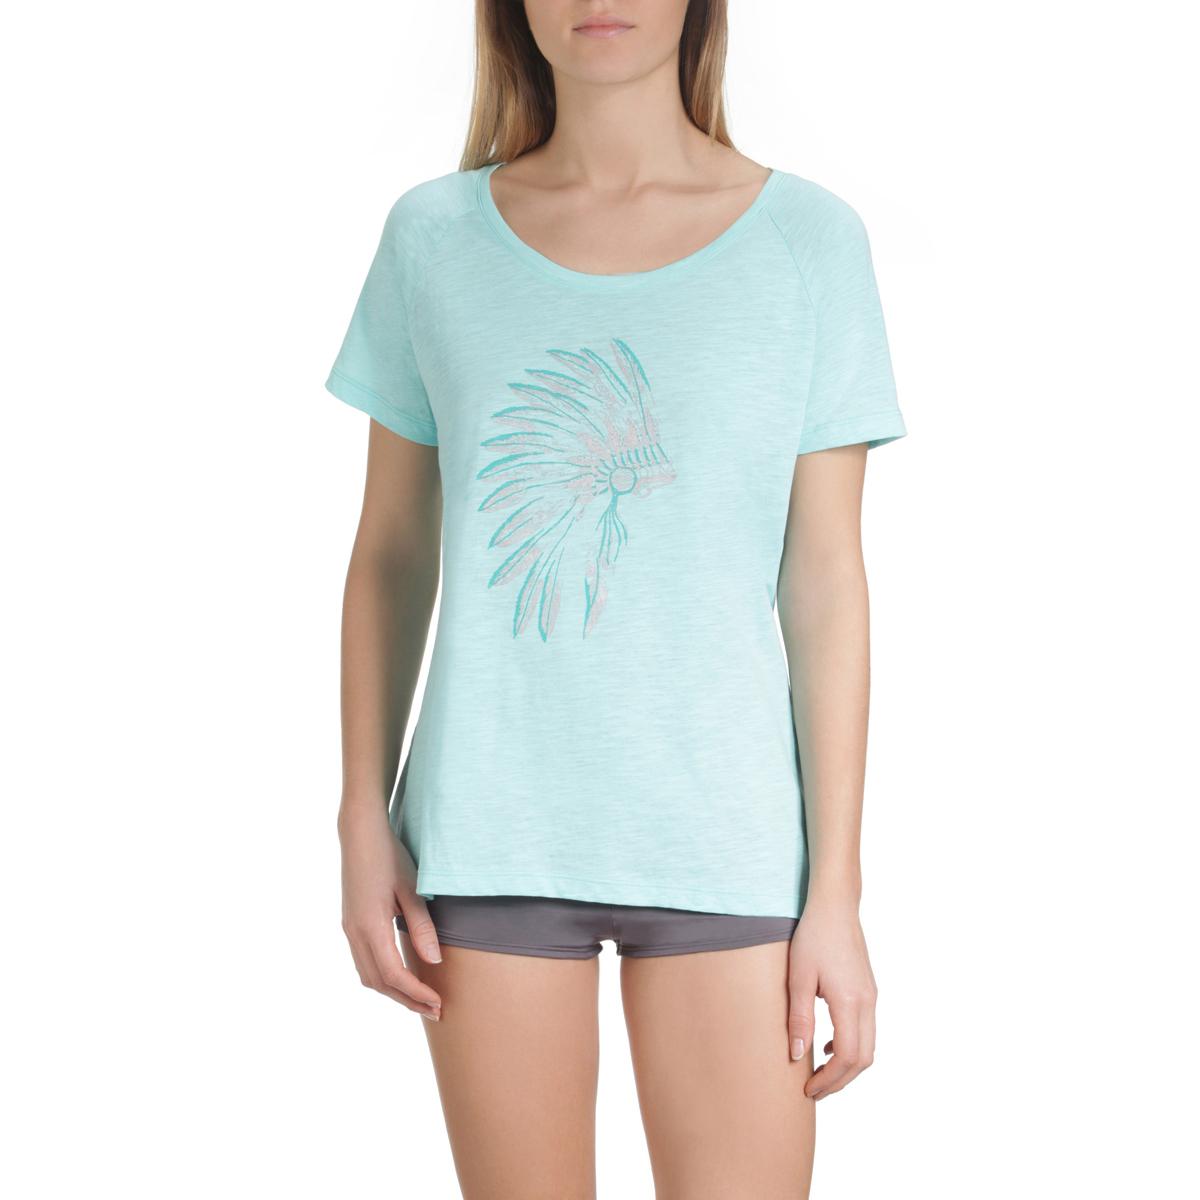 T-shirt de pyjama manches courtes bleu aqua Femme